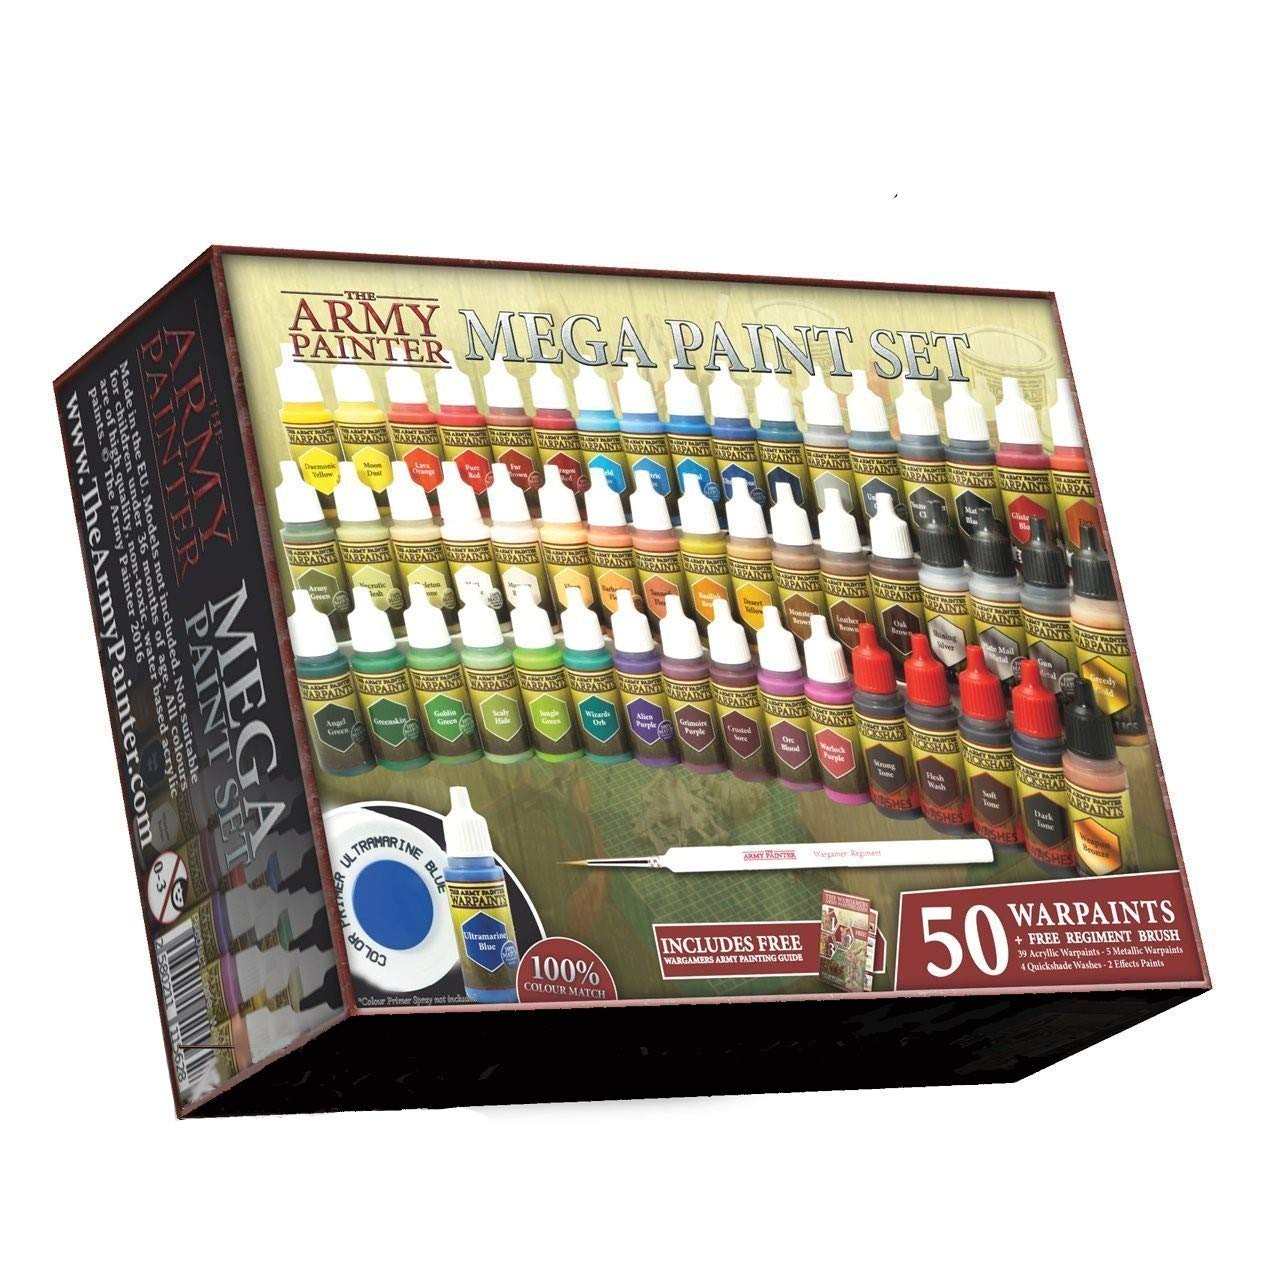 The Army Painter Miniature Painting Kit with Bonus Wargamer Regiment Miniature Paint Brush Review